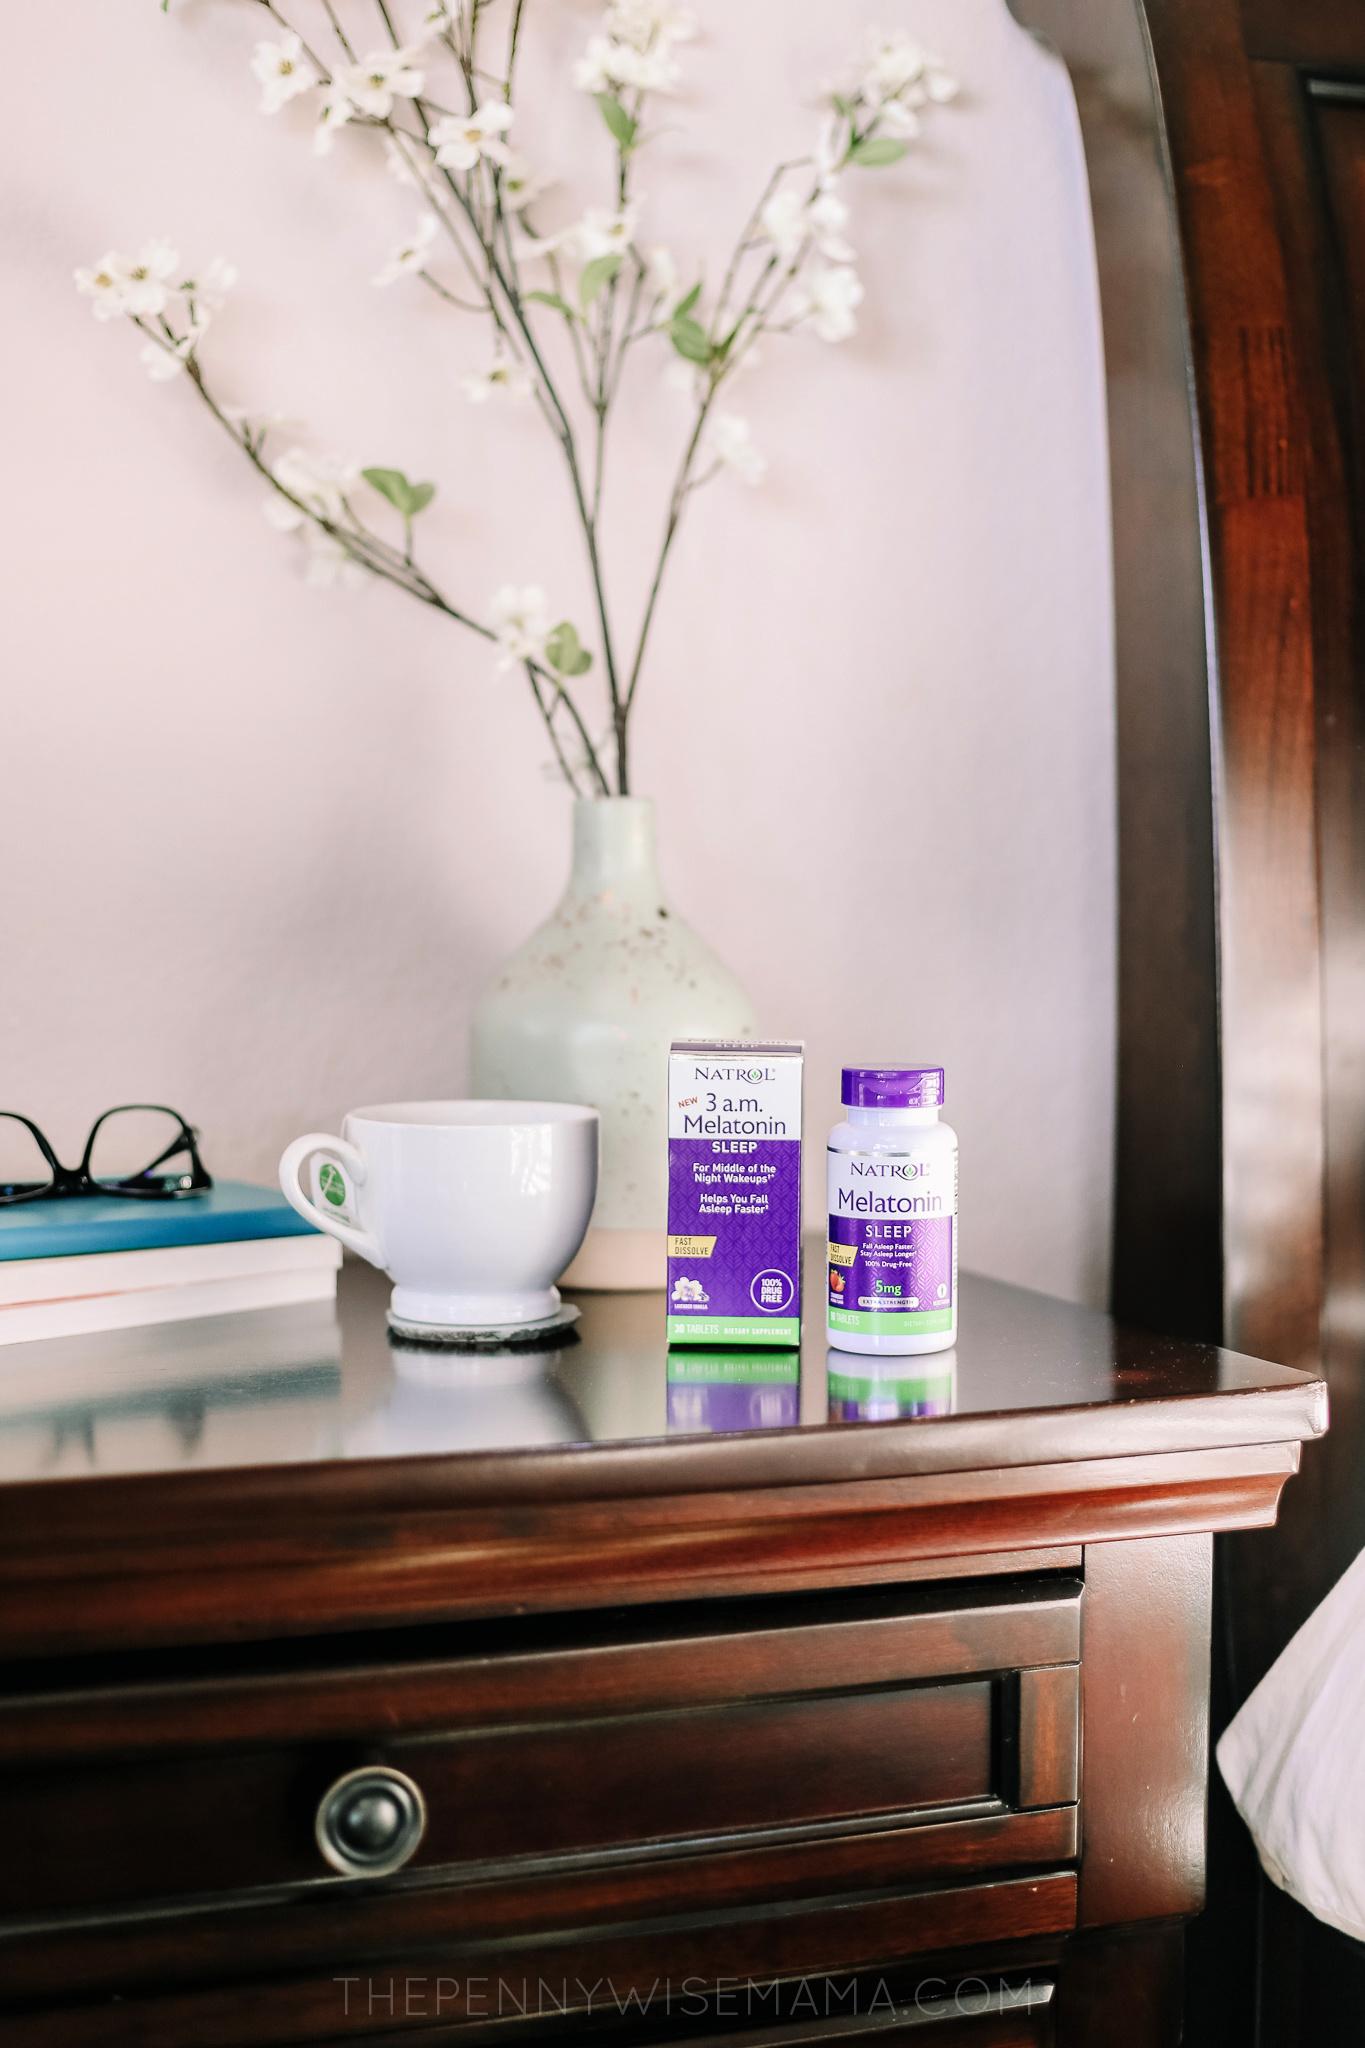 7 Tips to Sleep Better at Night with Natrol Melatonin